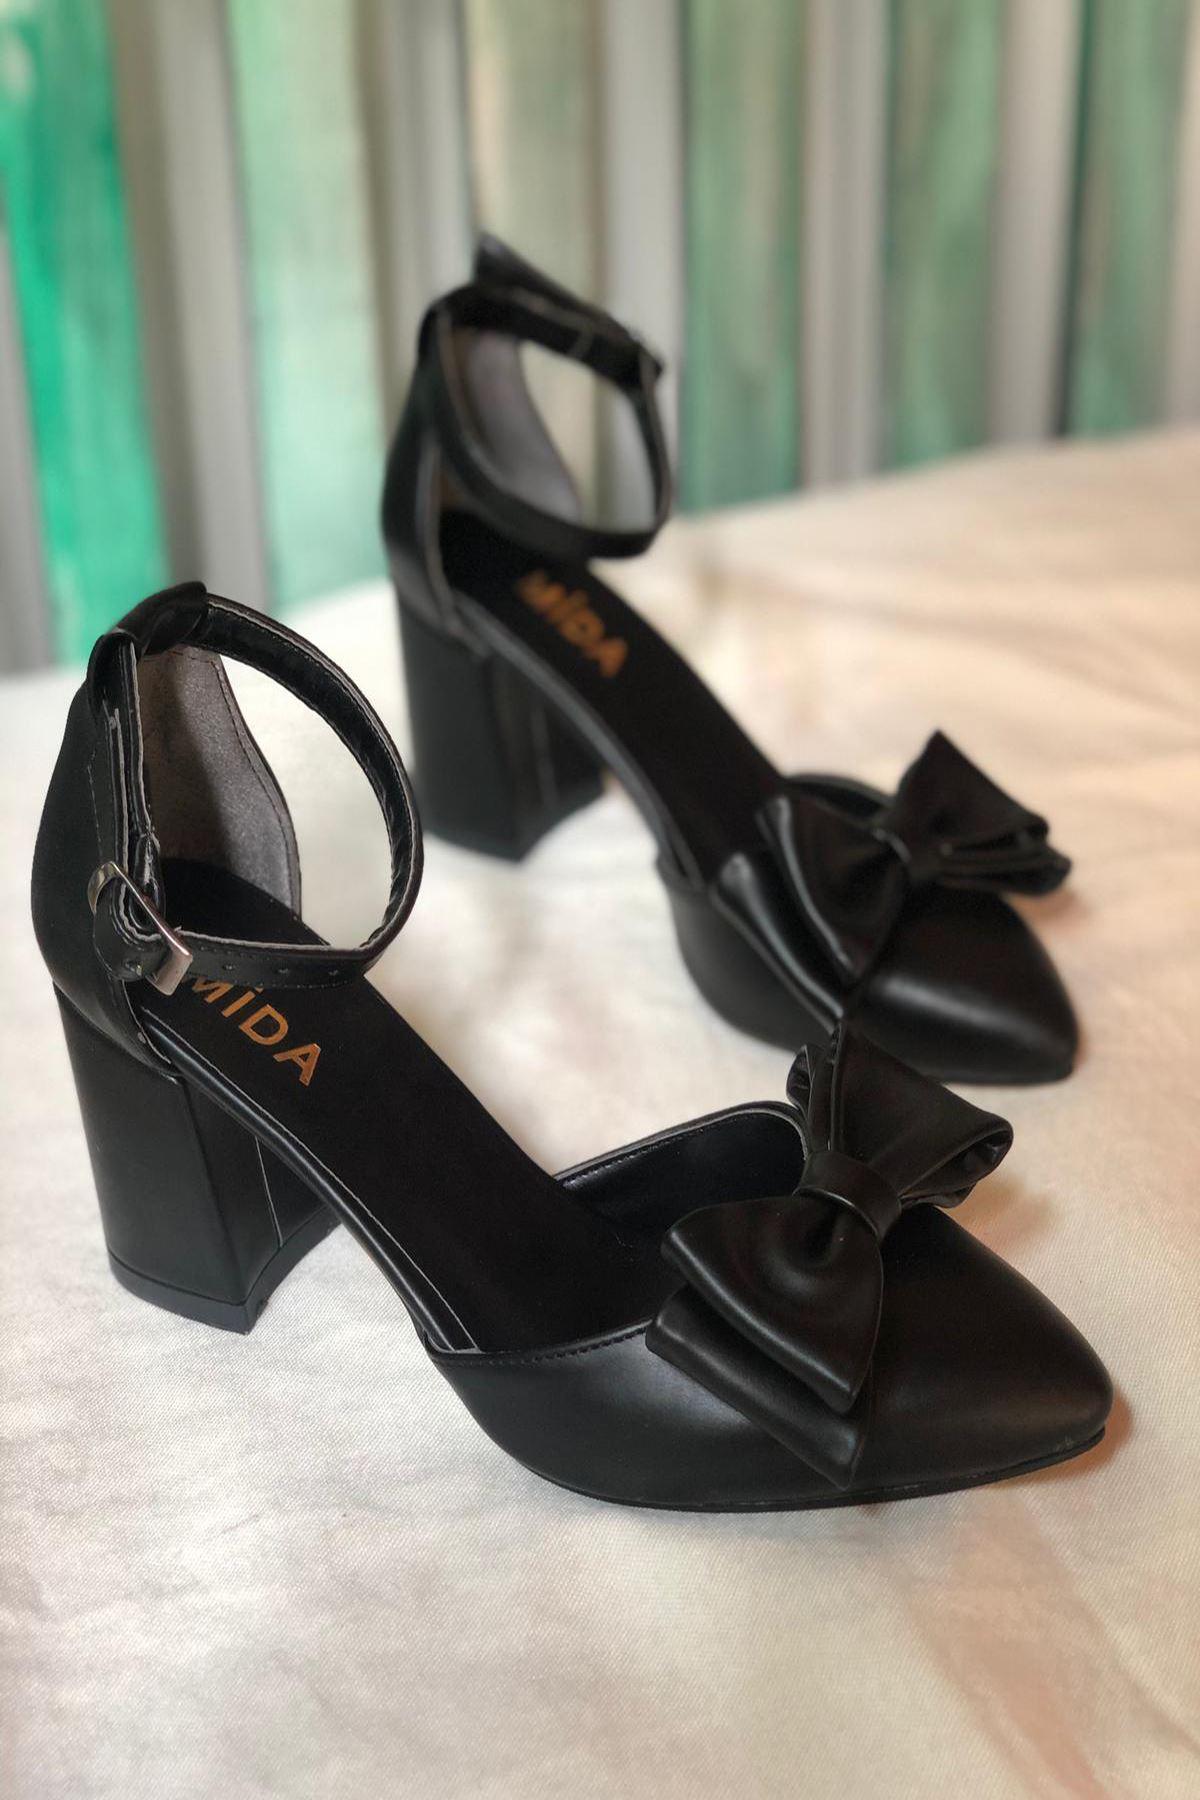 Y107 Siyah Deri Topuklu Ayakkabı